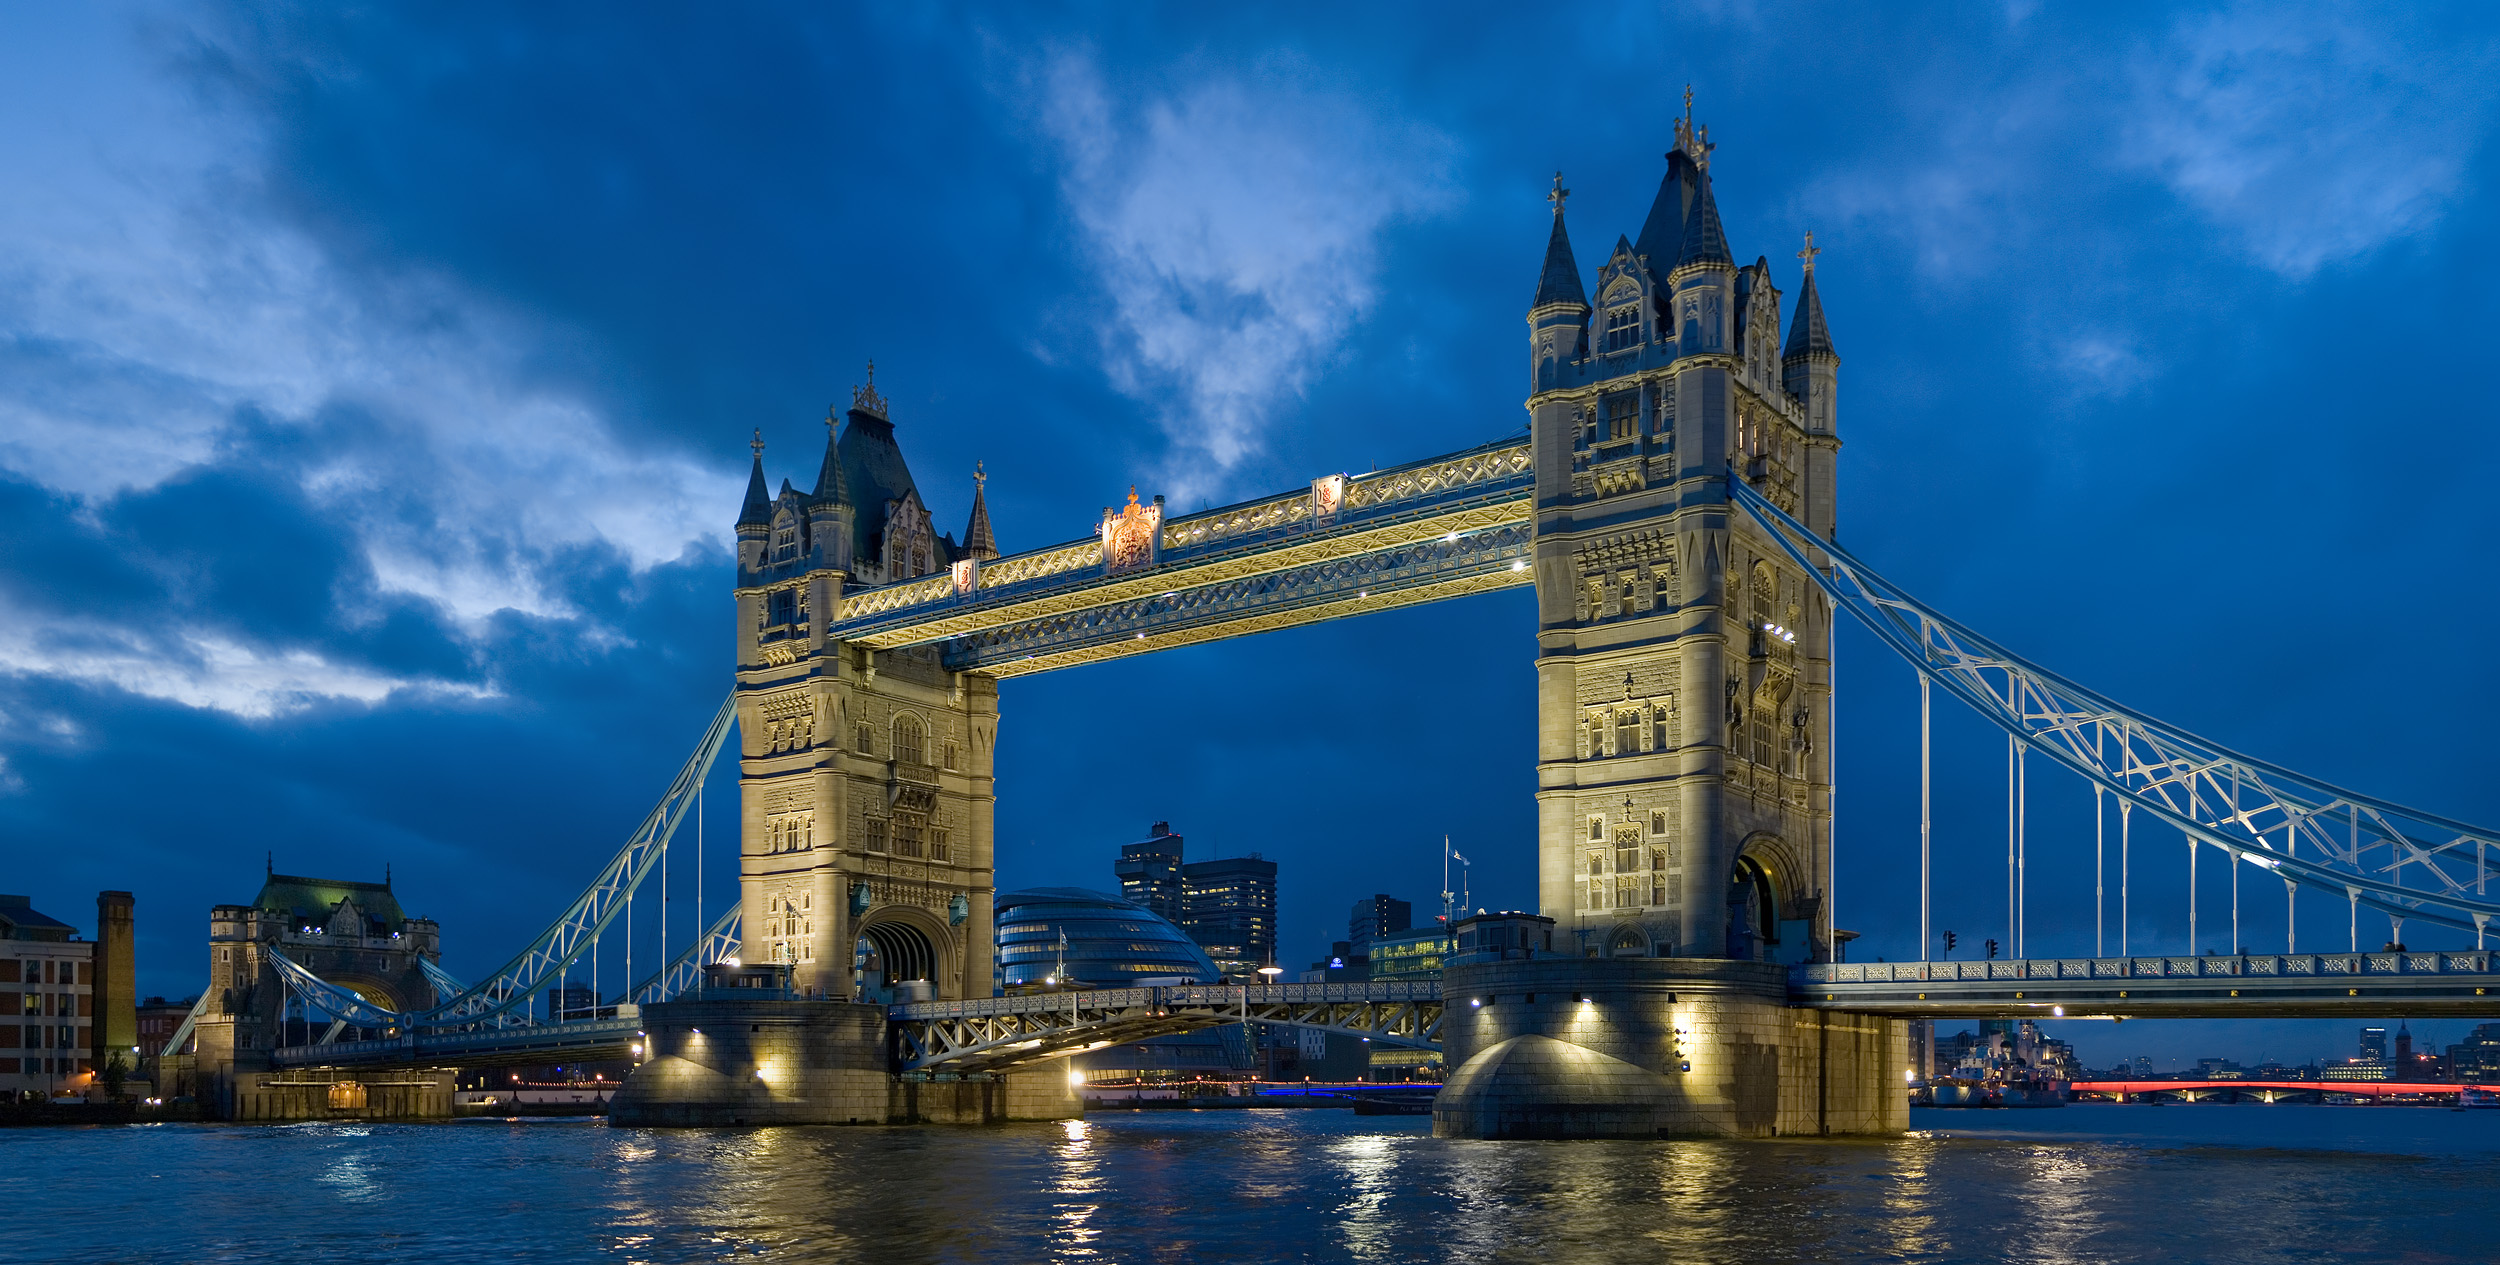 Tower_bridge_London_Twilight_-_November_2006.jpg